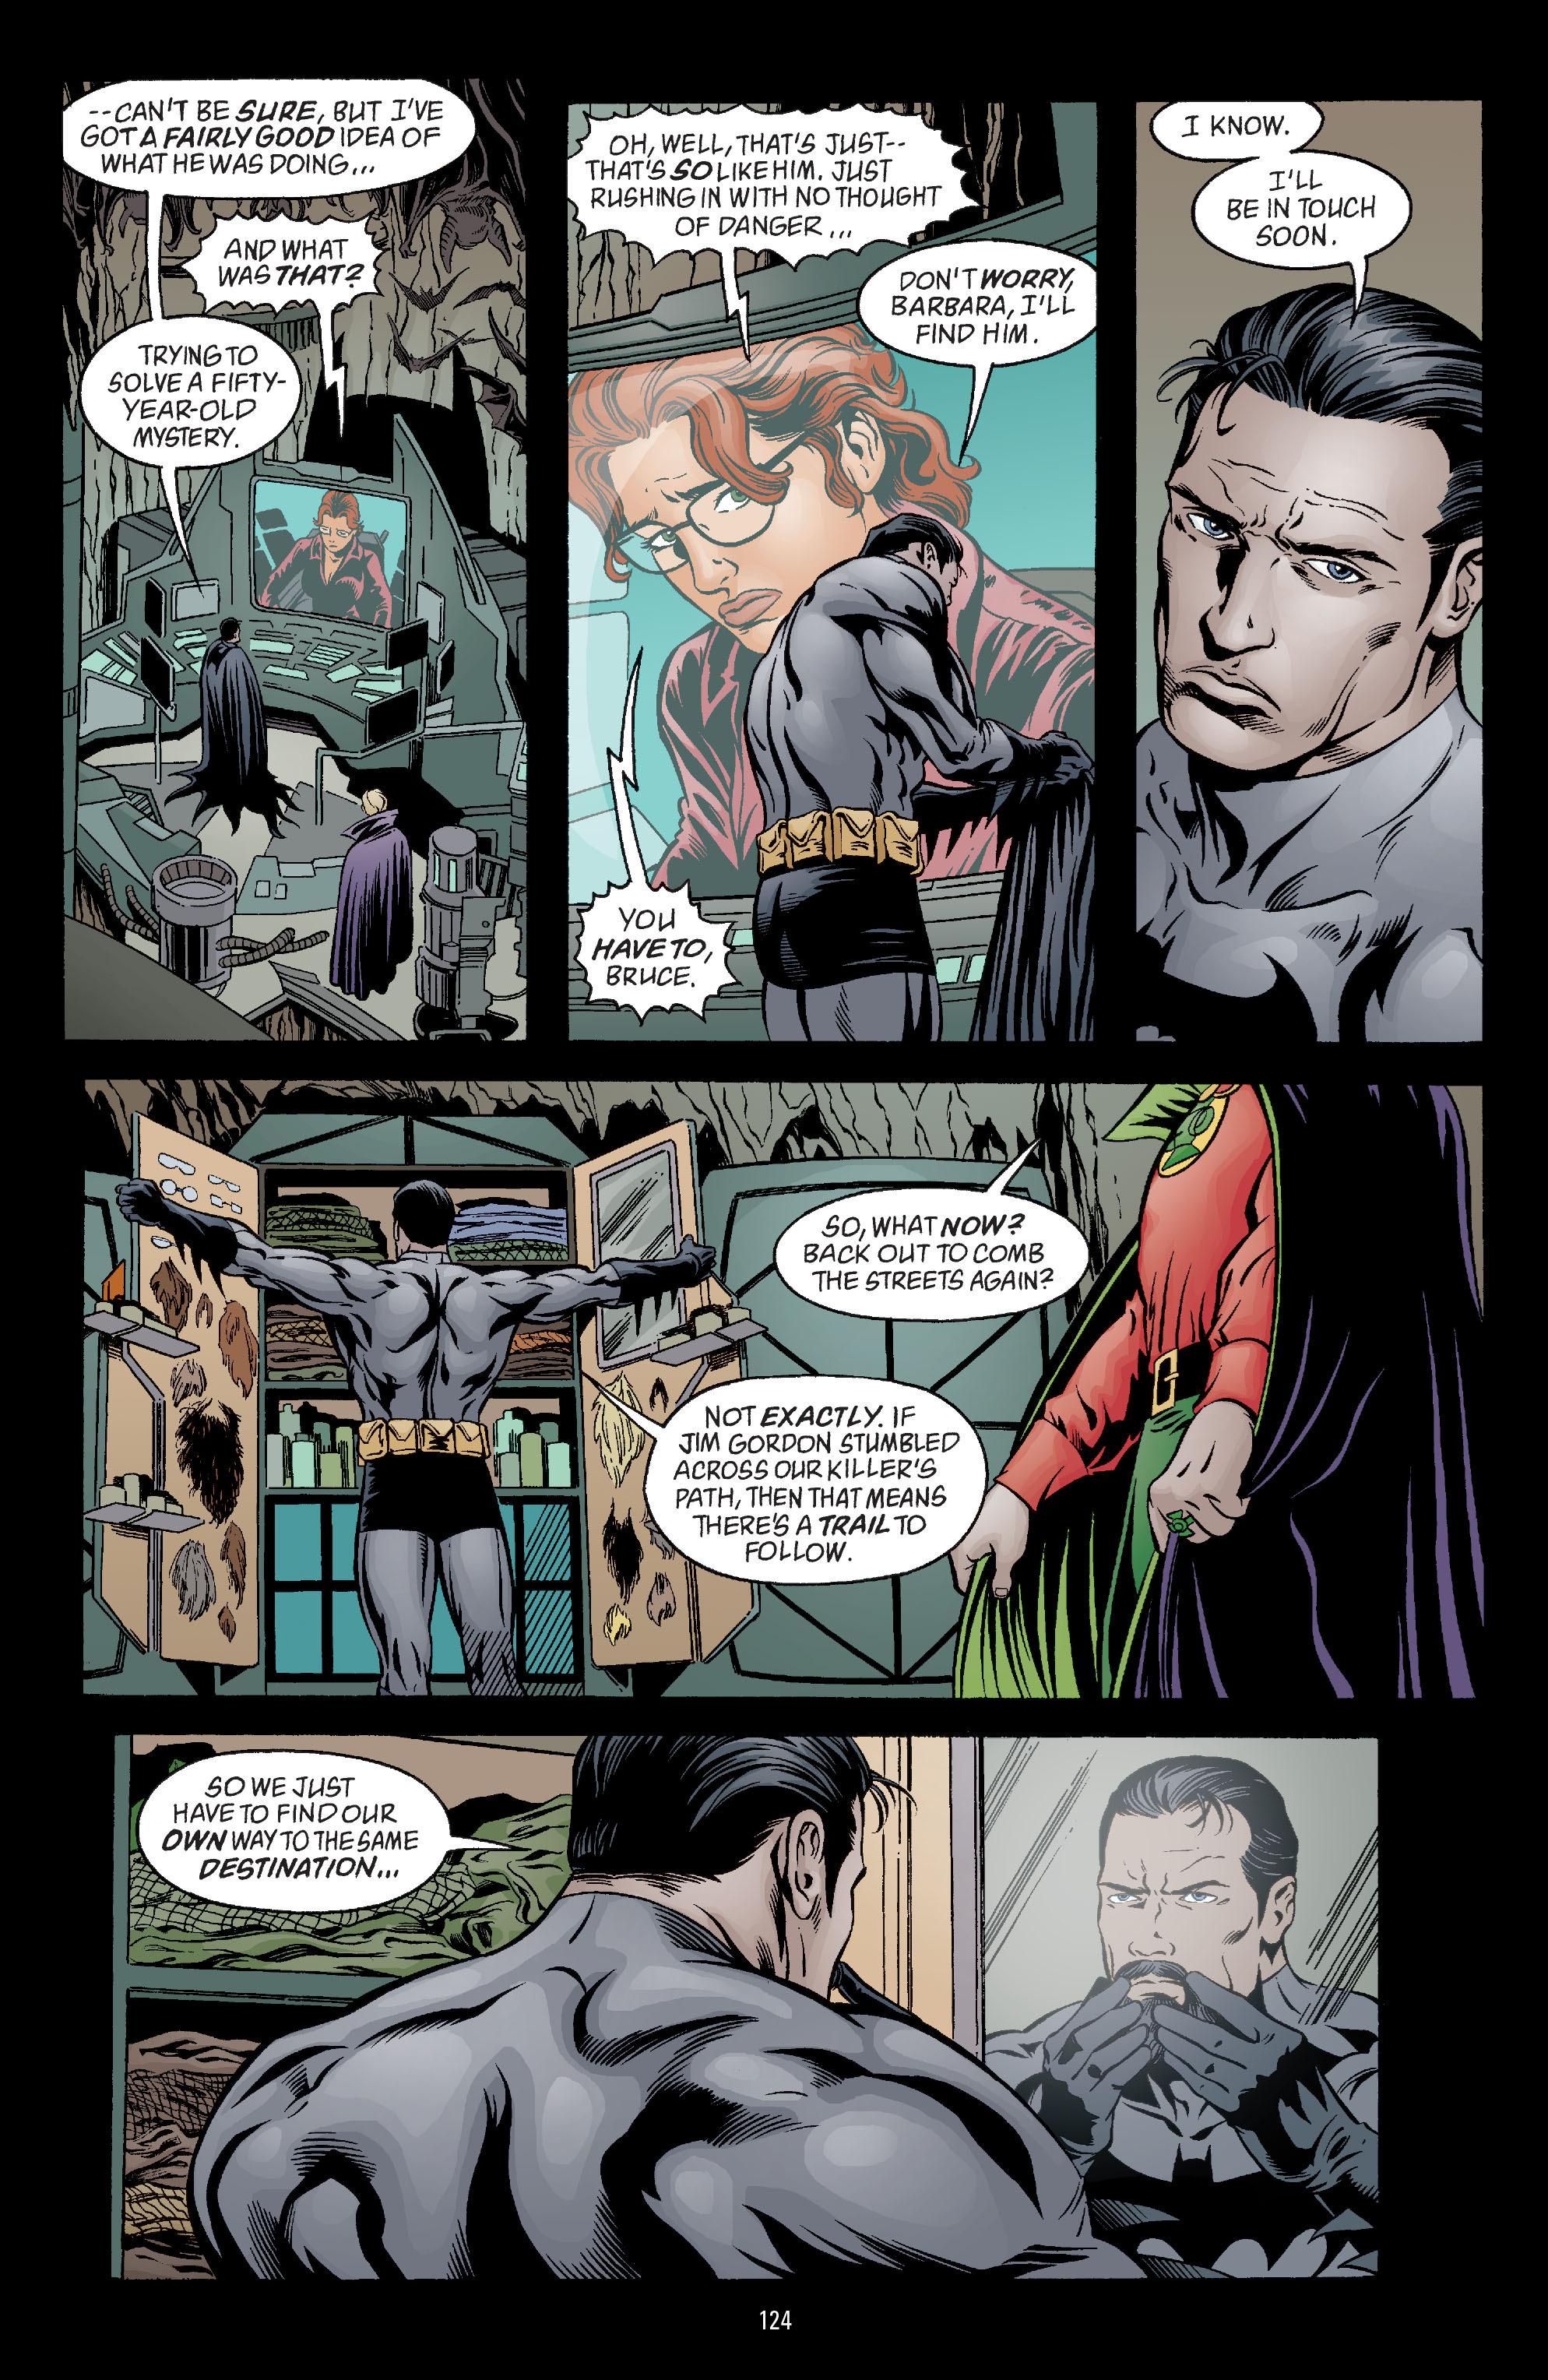 Batman: The Man Who Laughs chap 1 pic 125